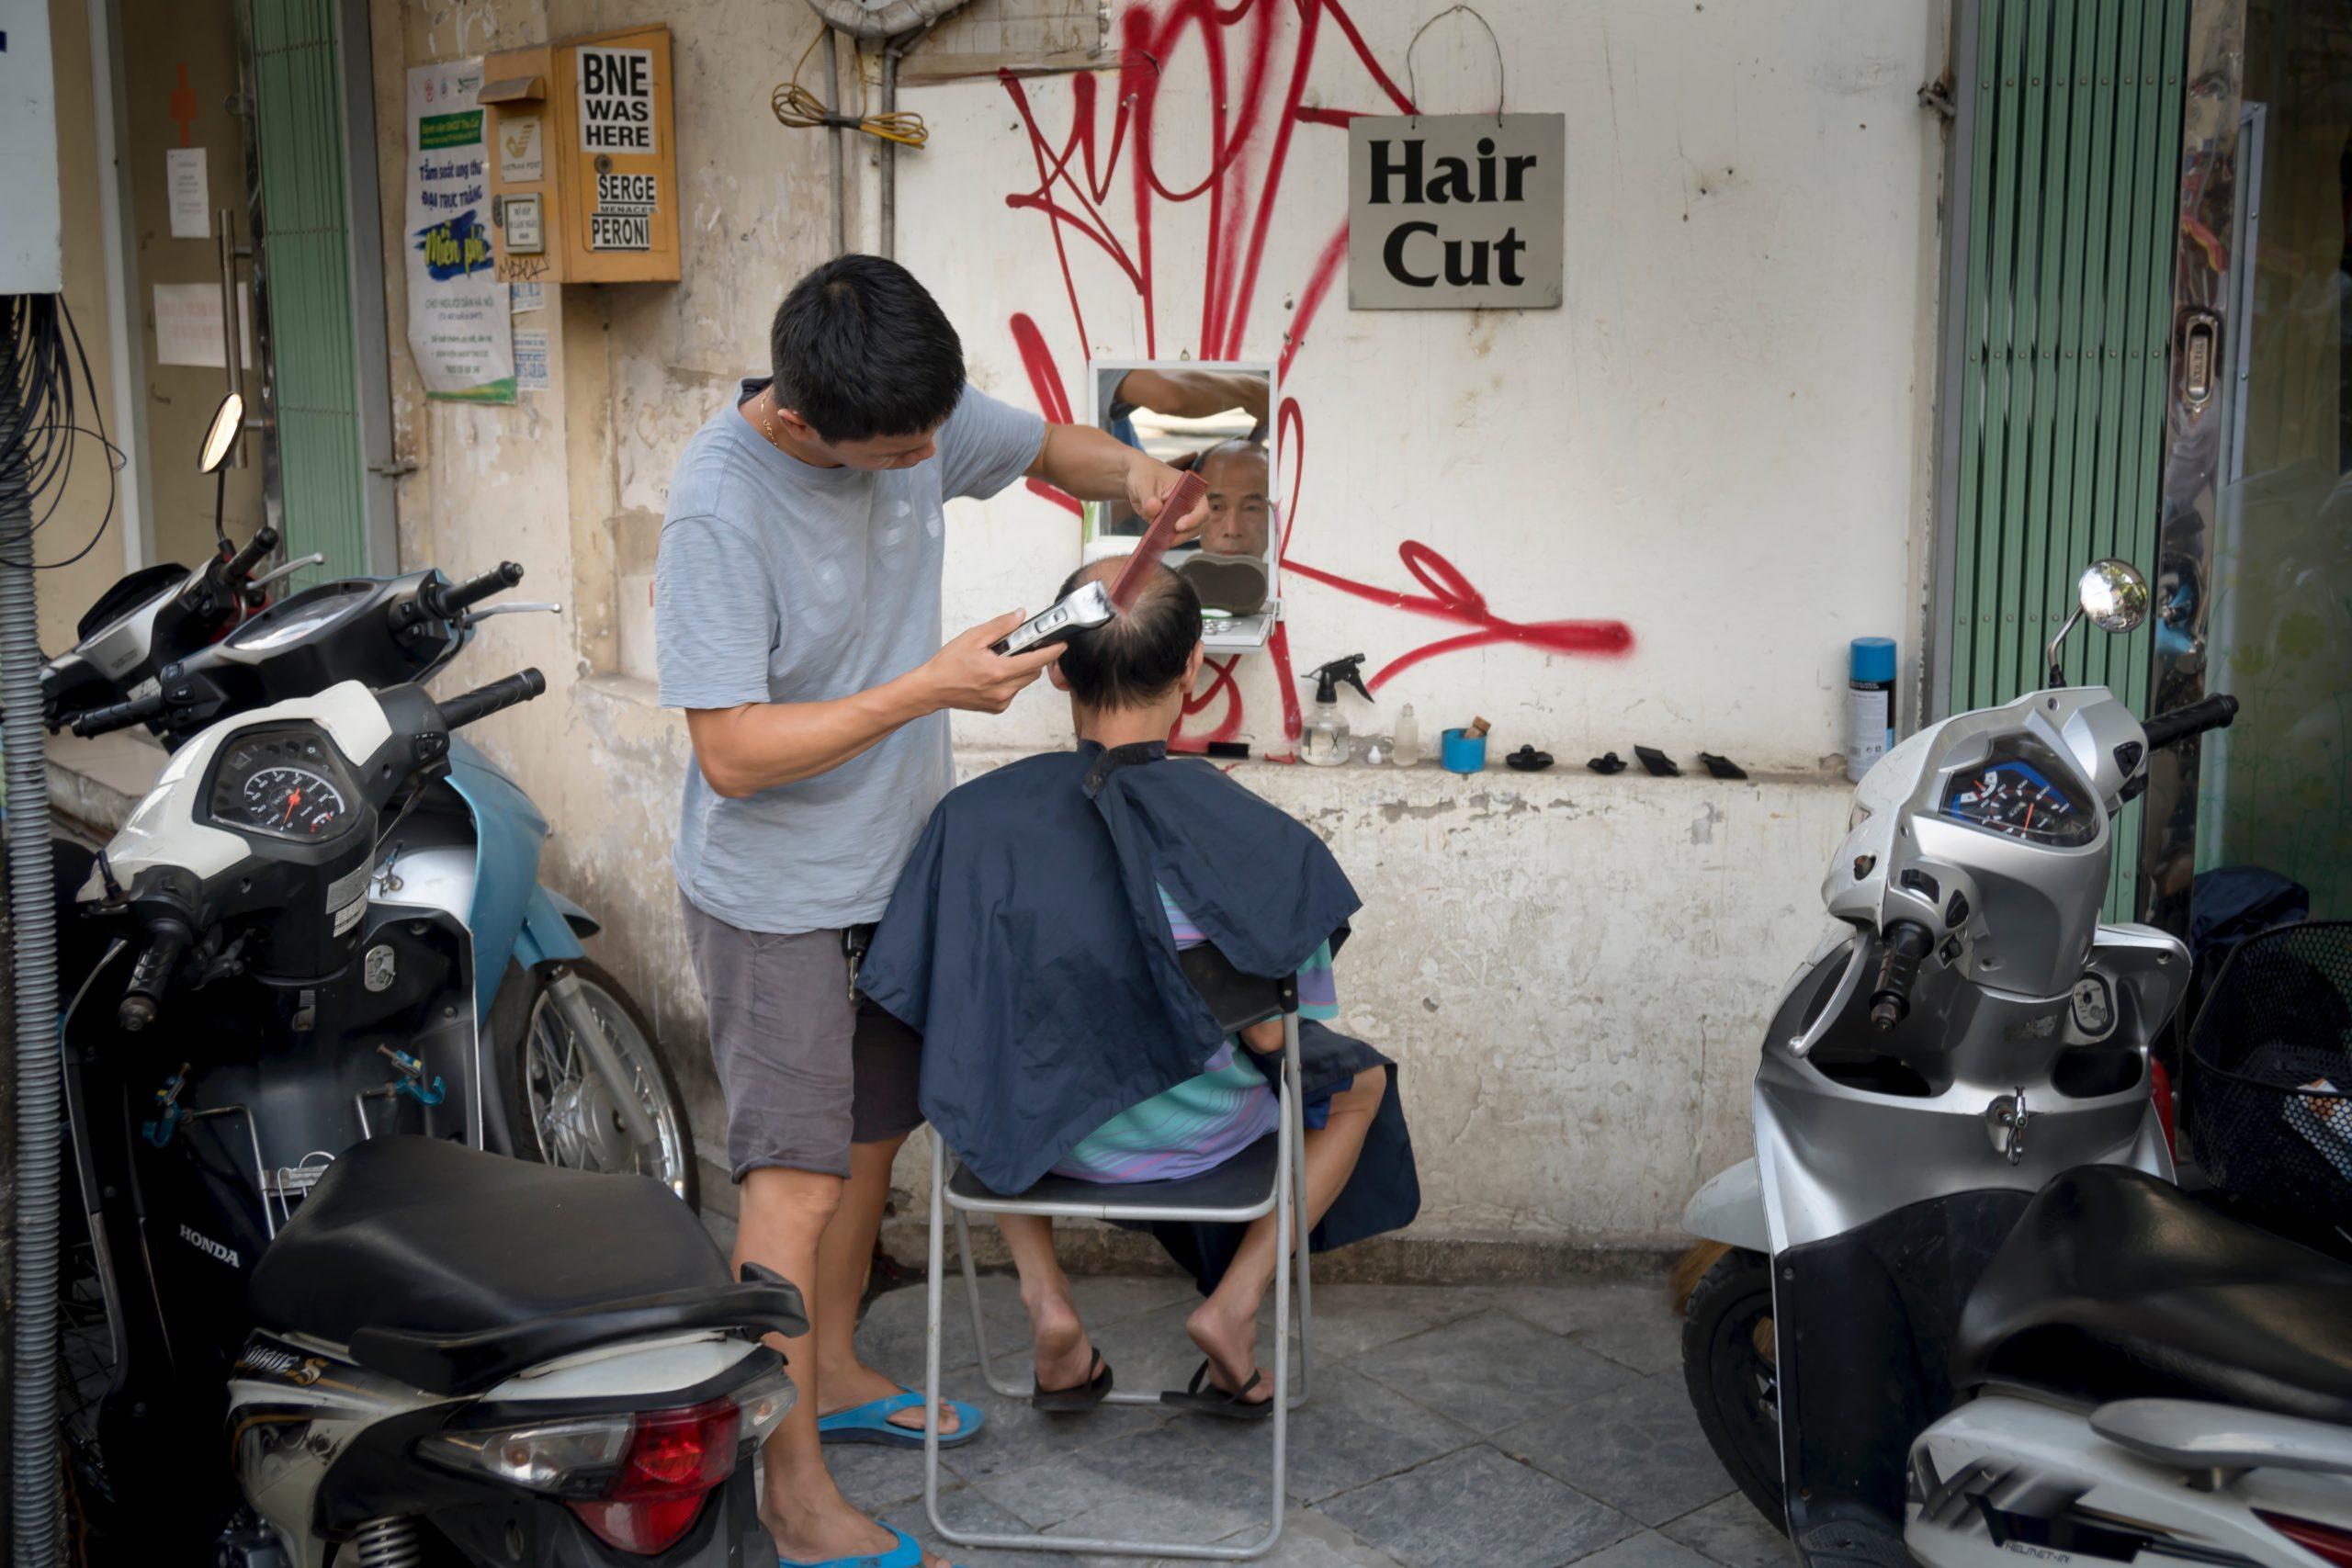 Haircut during lockdown